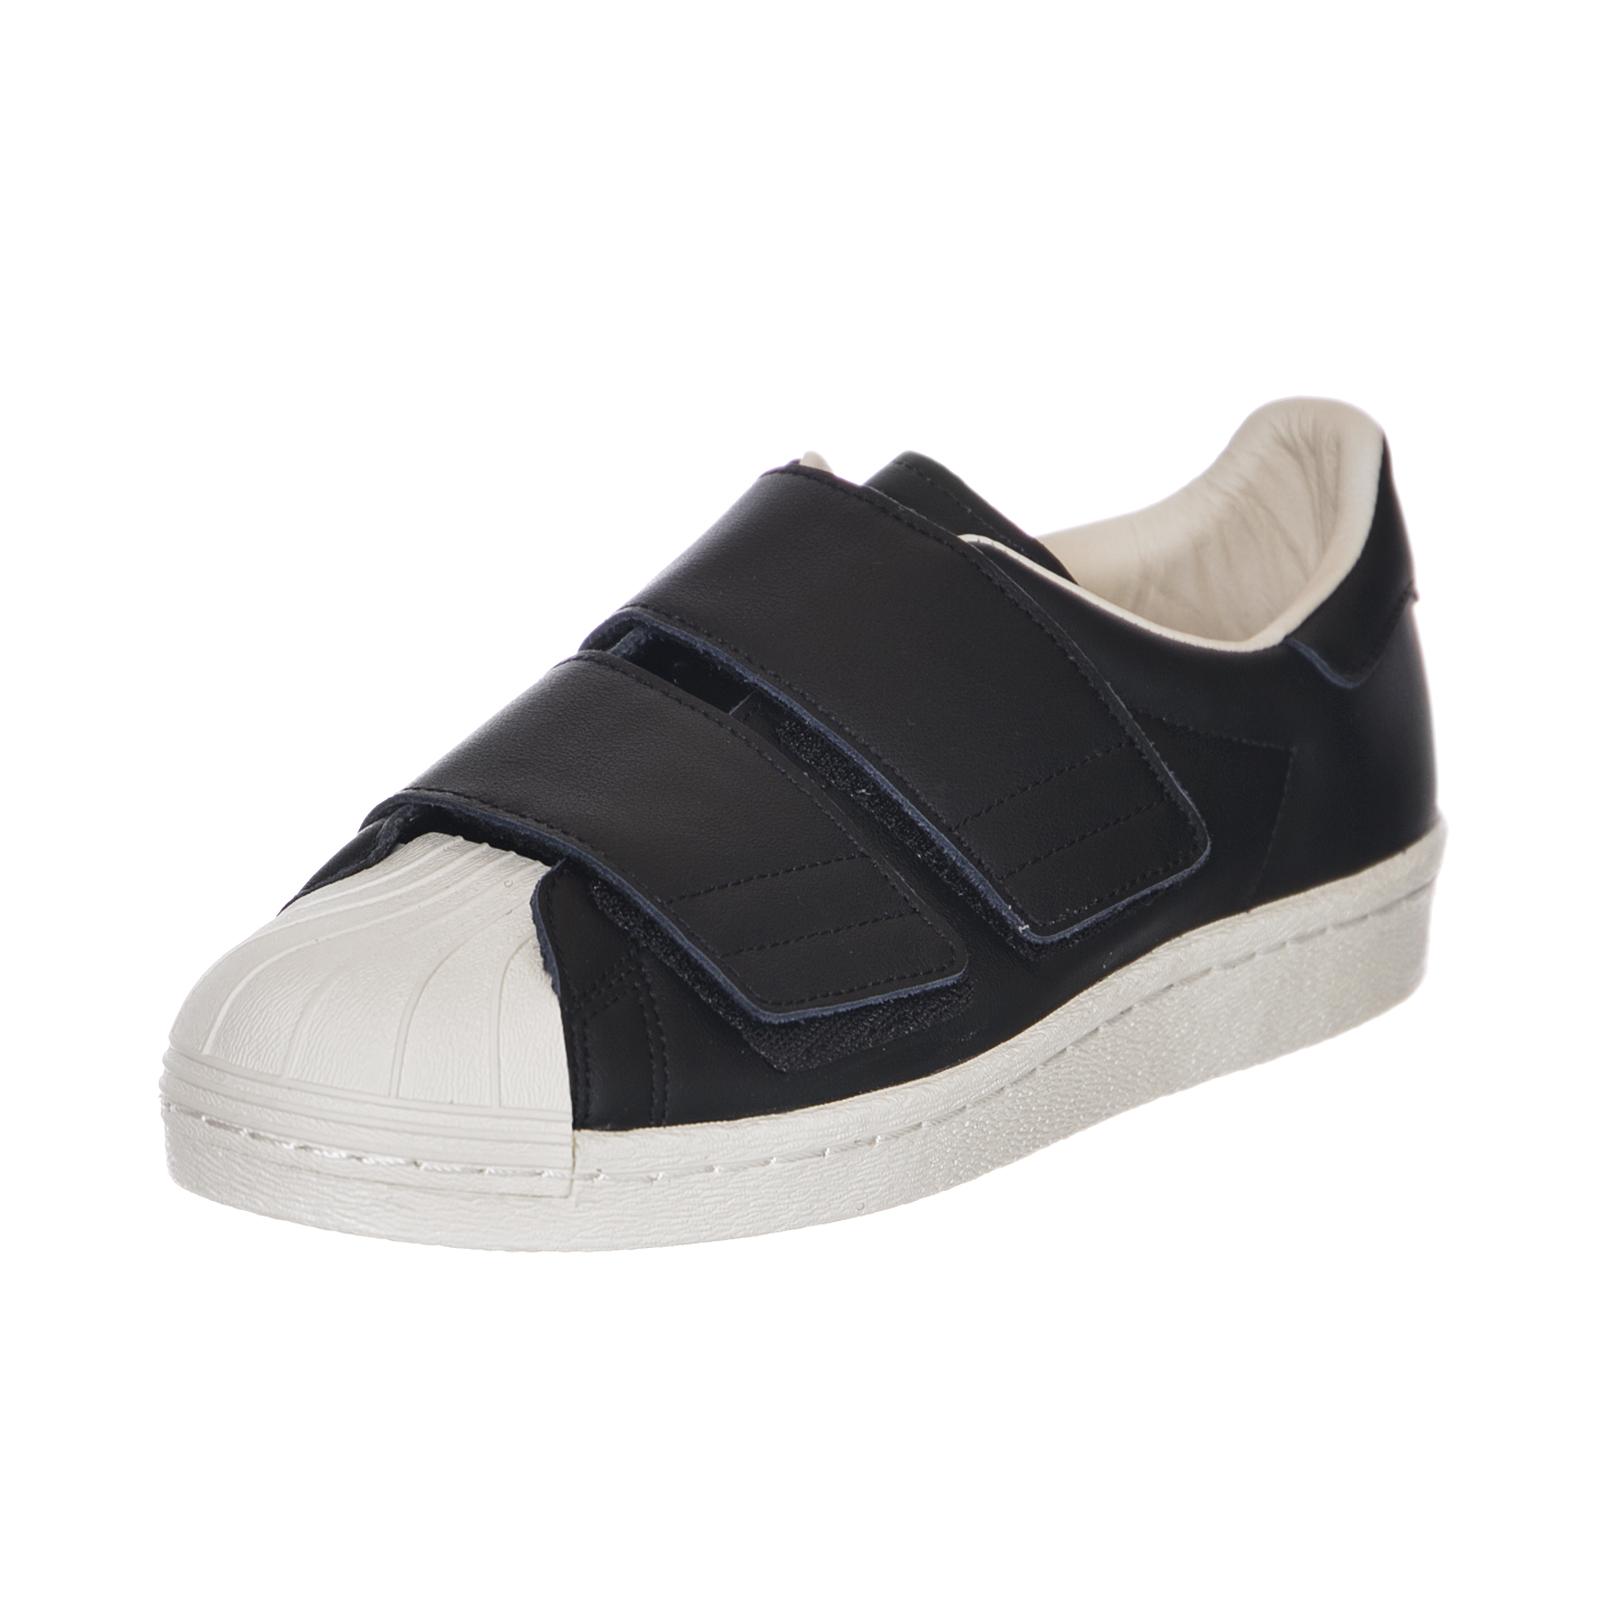 Adidas Sneakers Superstar 80S Cf W Noir / Noir Nero